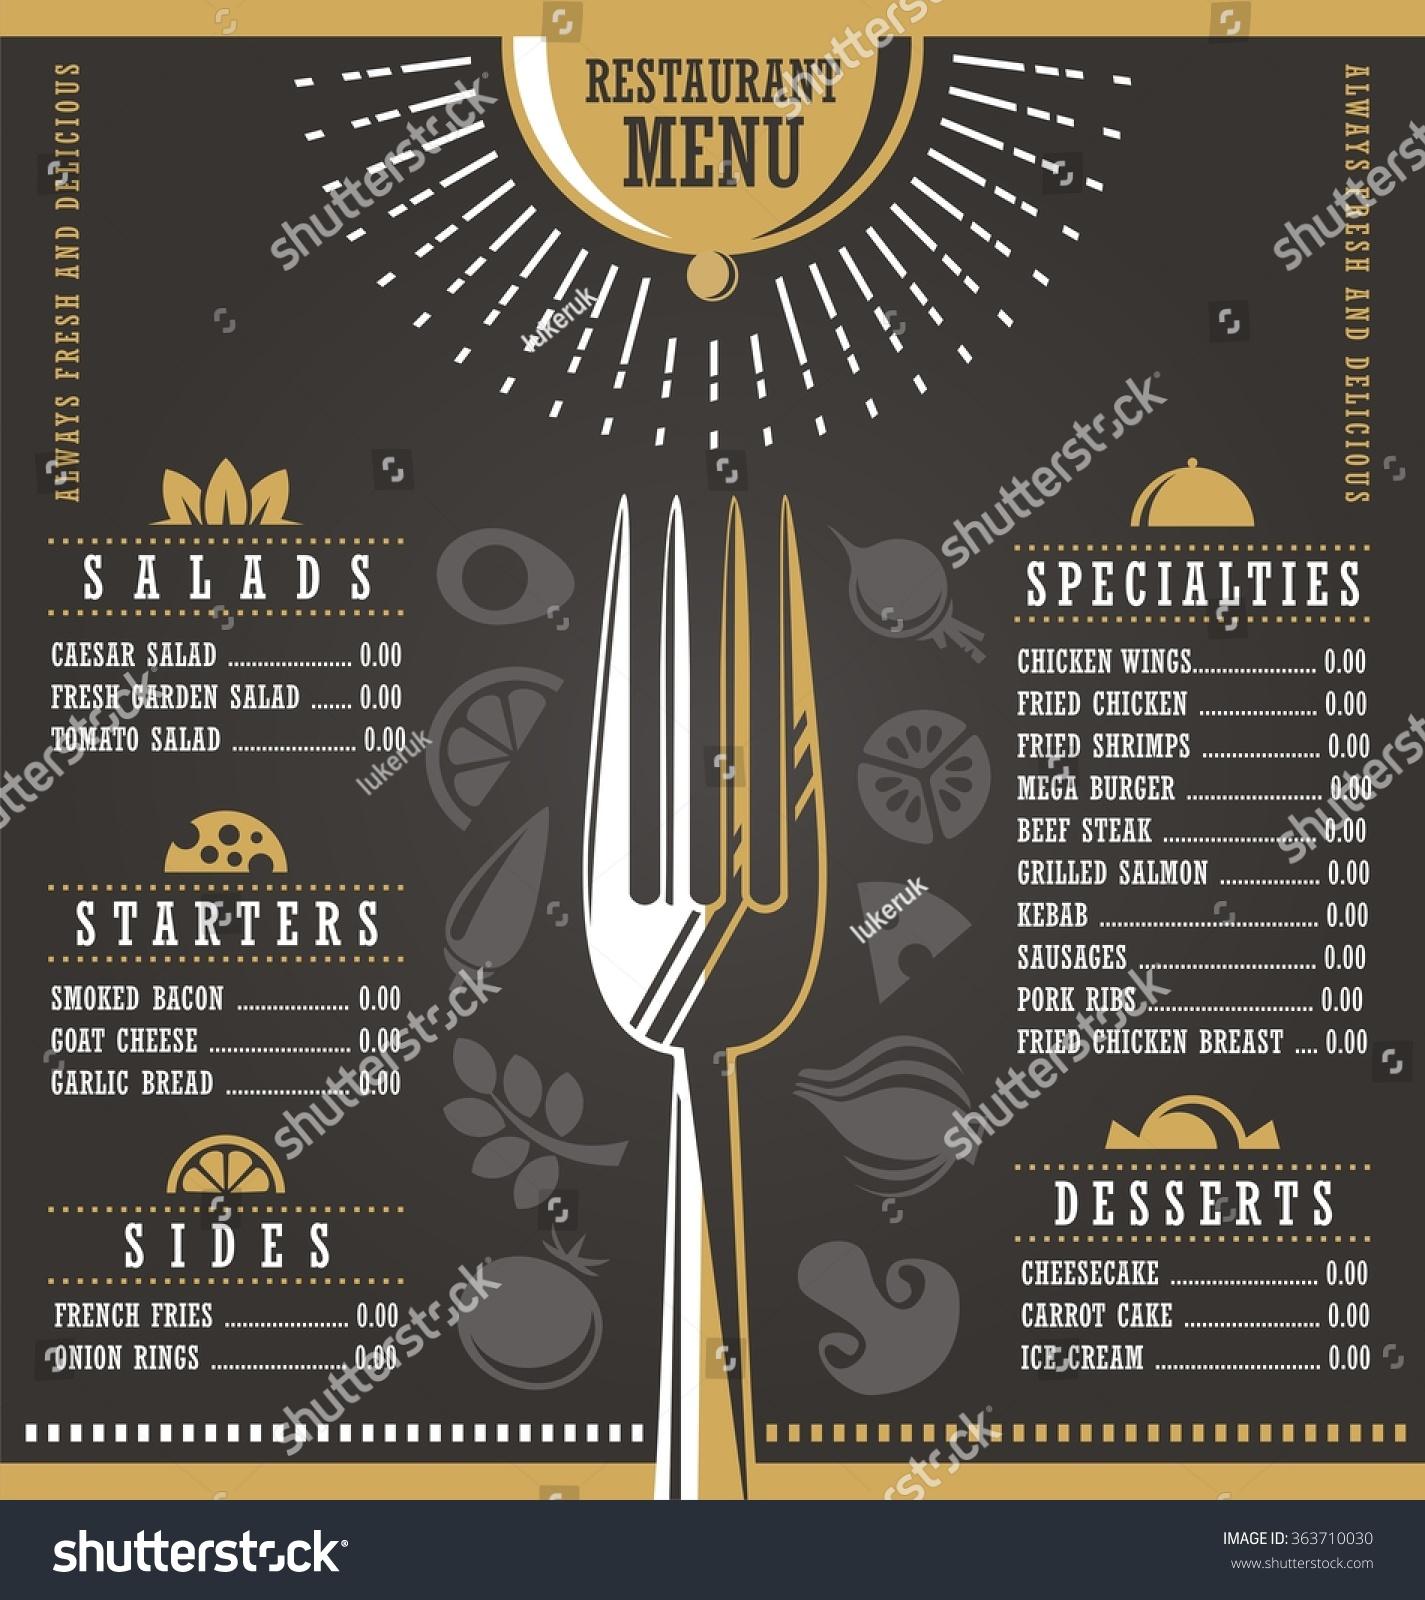 royalty-free restaurant menu design. abstract menu… #363710030 stock